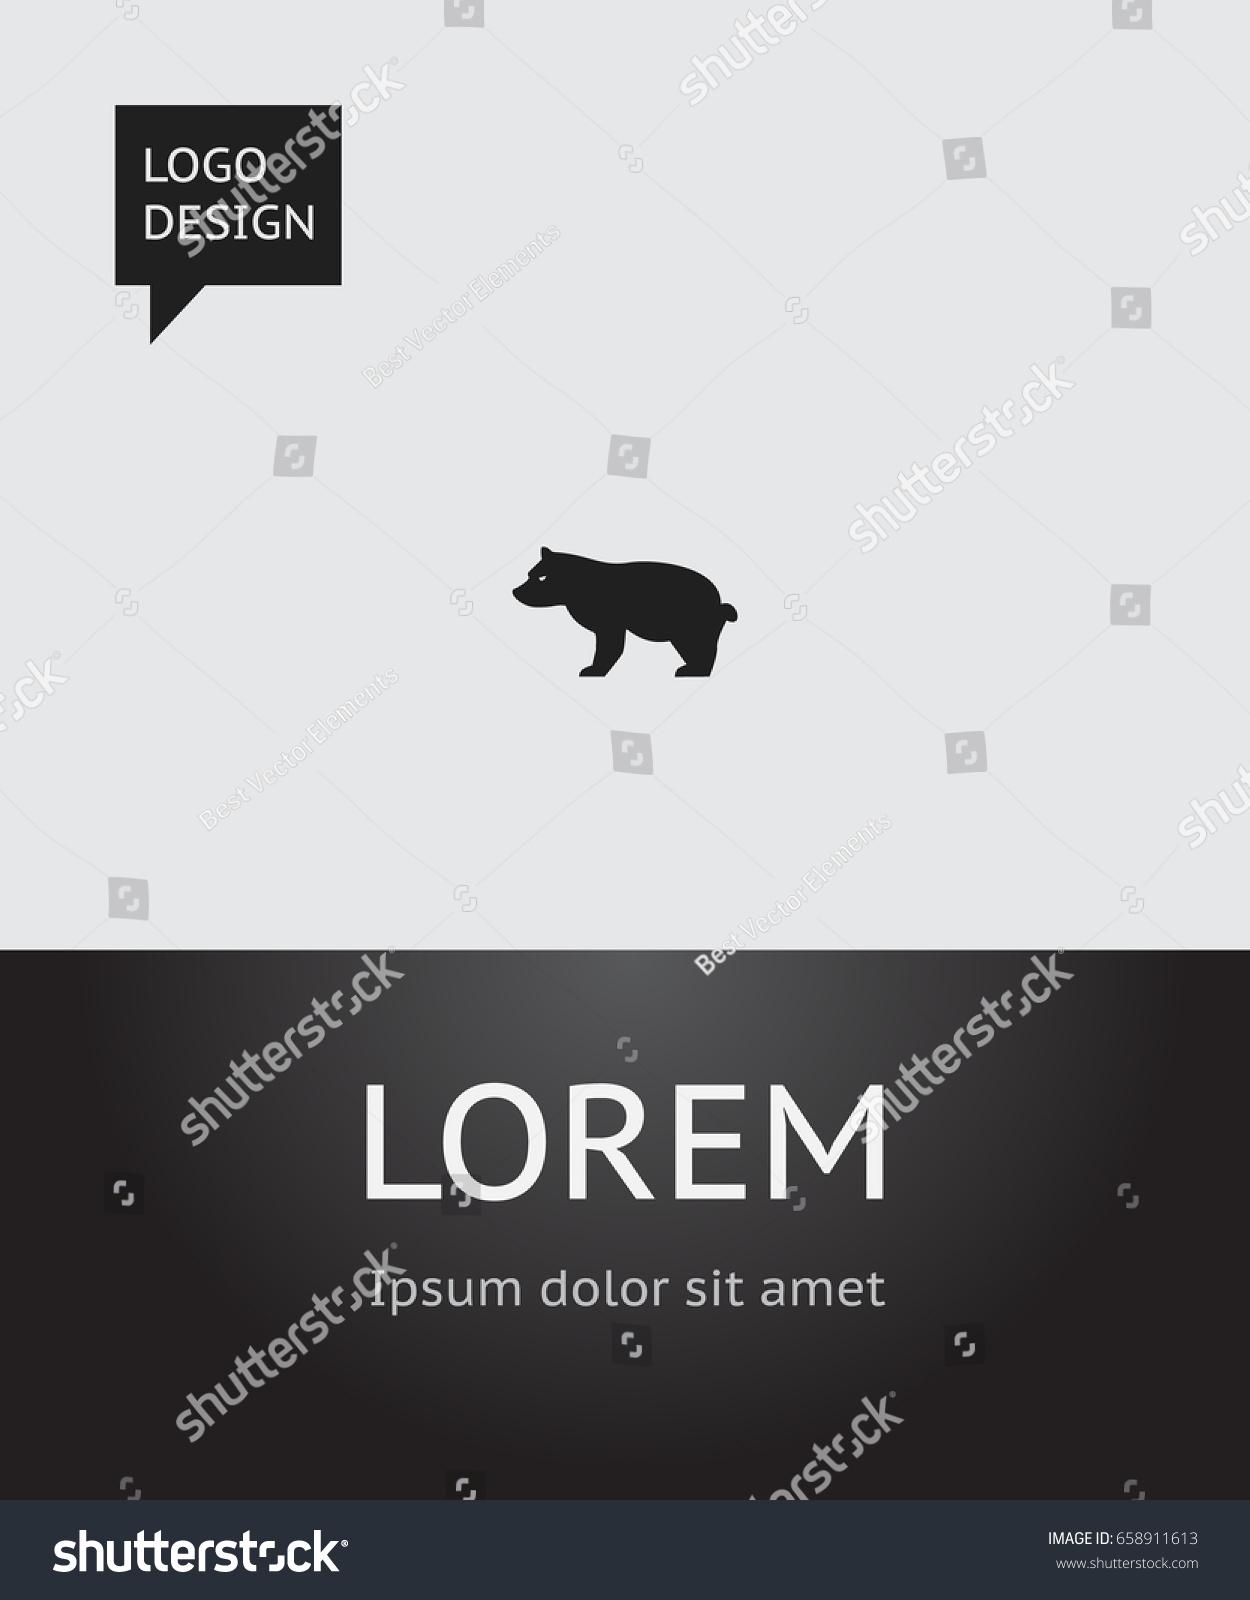 Zoology poster design - Zoology Poster Design Vector Illustration Of Zoology Symbol On Grizzly Icon Premium Quality Isolated Polar